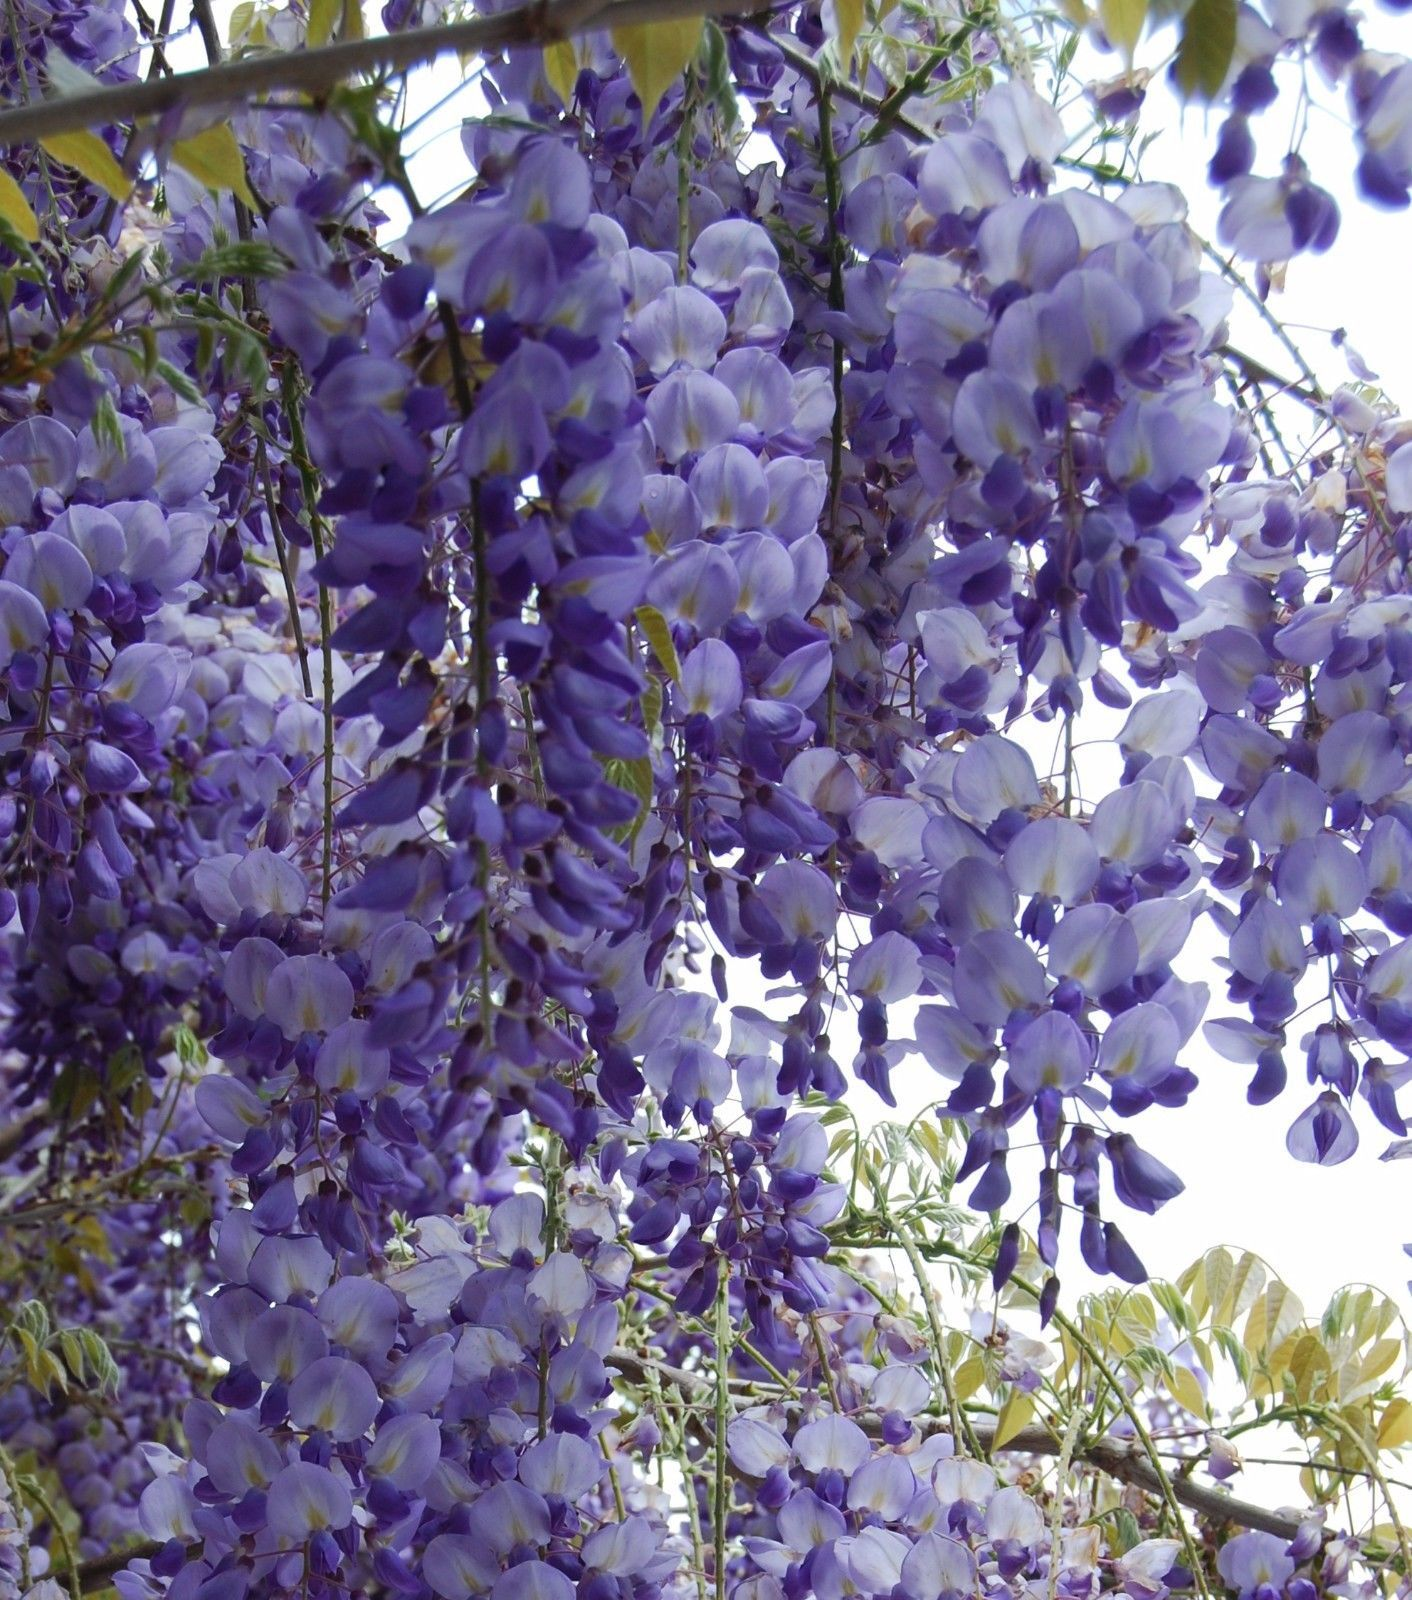 1 X 2 Ft Wisteria Sinensis Plant Rare Fragrant Climber Plant 3lt Ebay Plants Climber Plants Online Plant Nursery